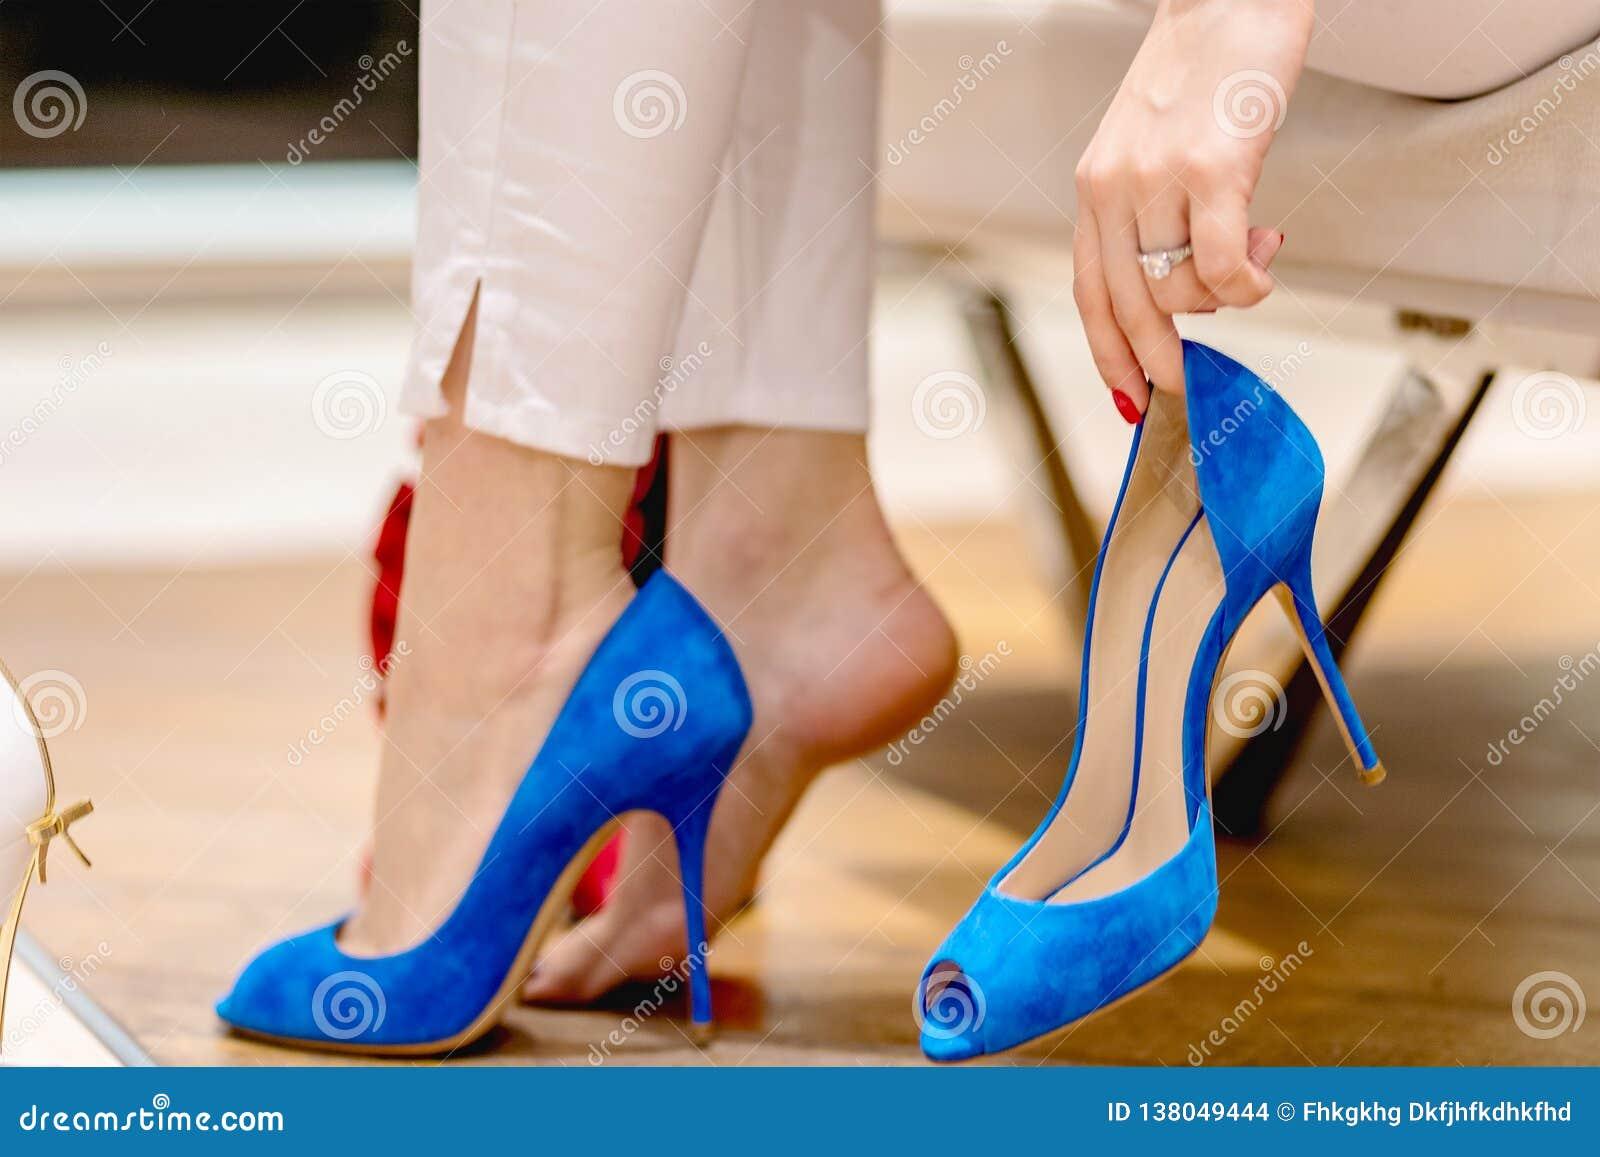 8c2d2768c Beautiful Legs. Woman Trying Many Shoes. Choosing. Stock Photo ...